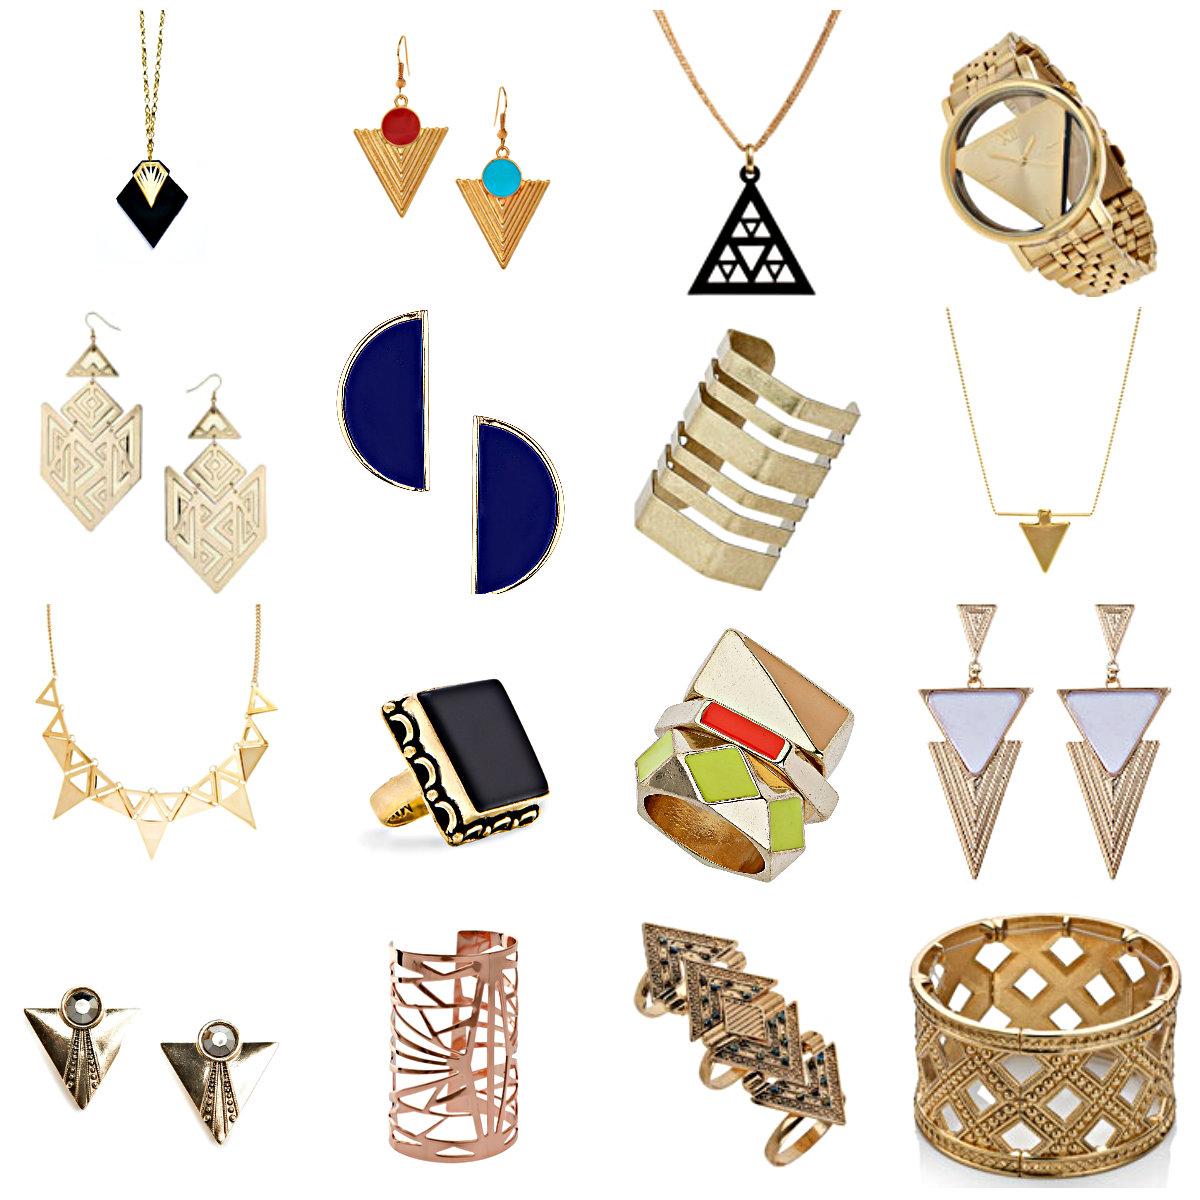 Art deco jewellery orlalouise for Art deco costume jewelry